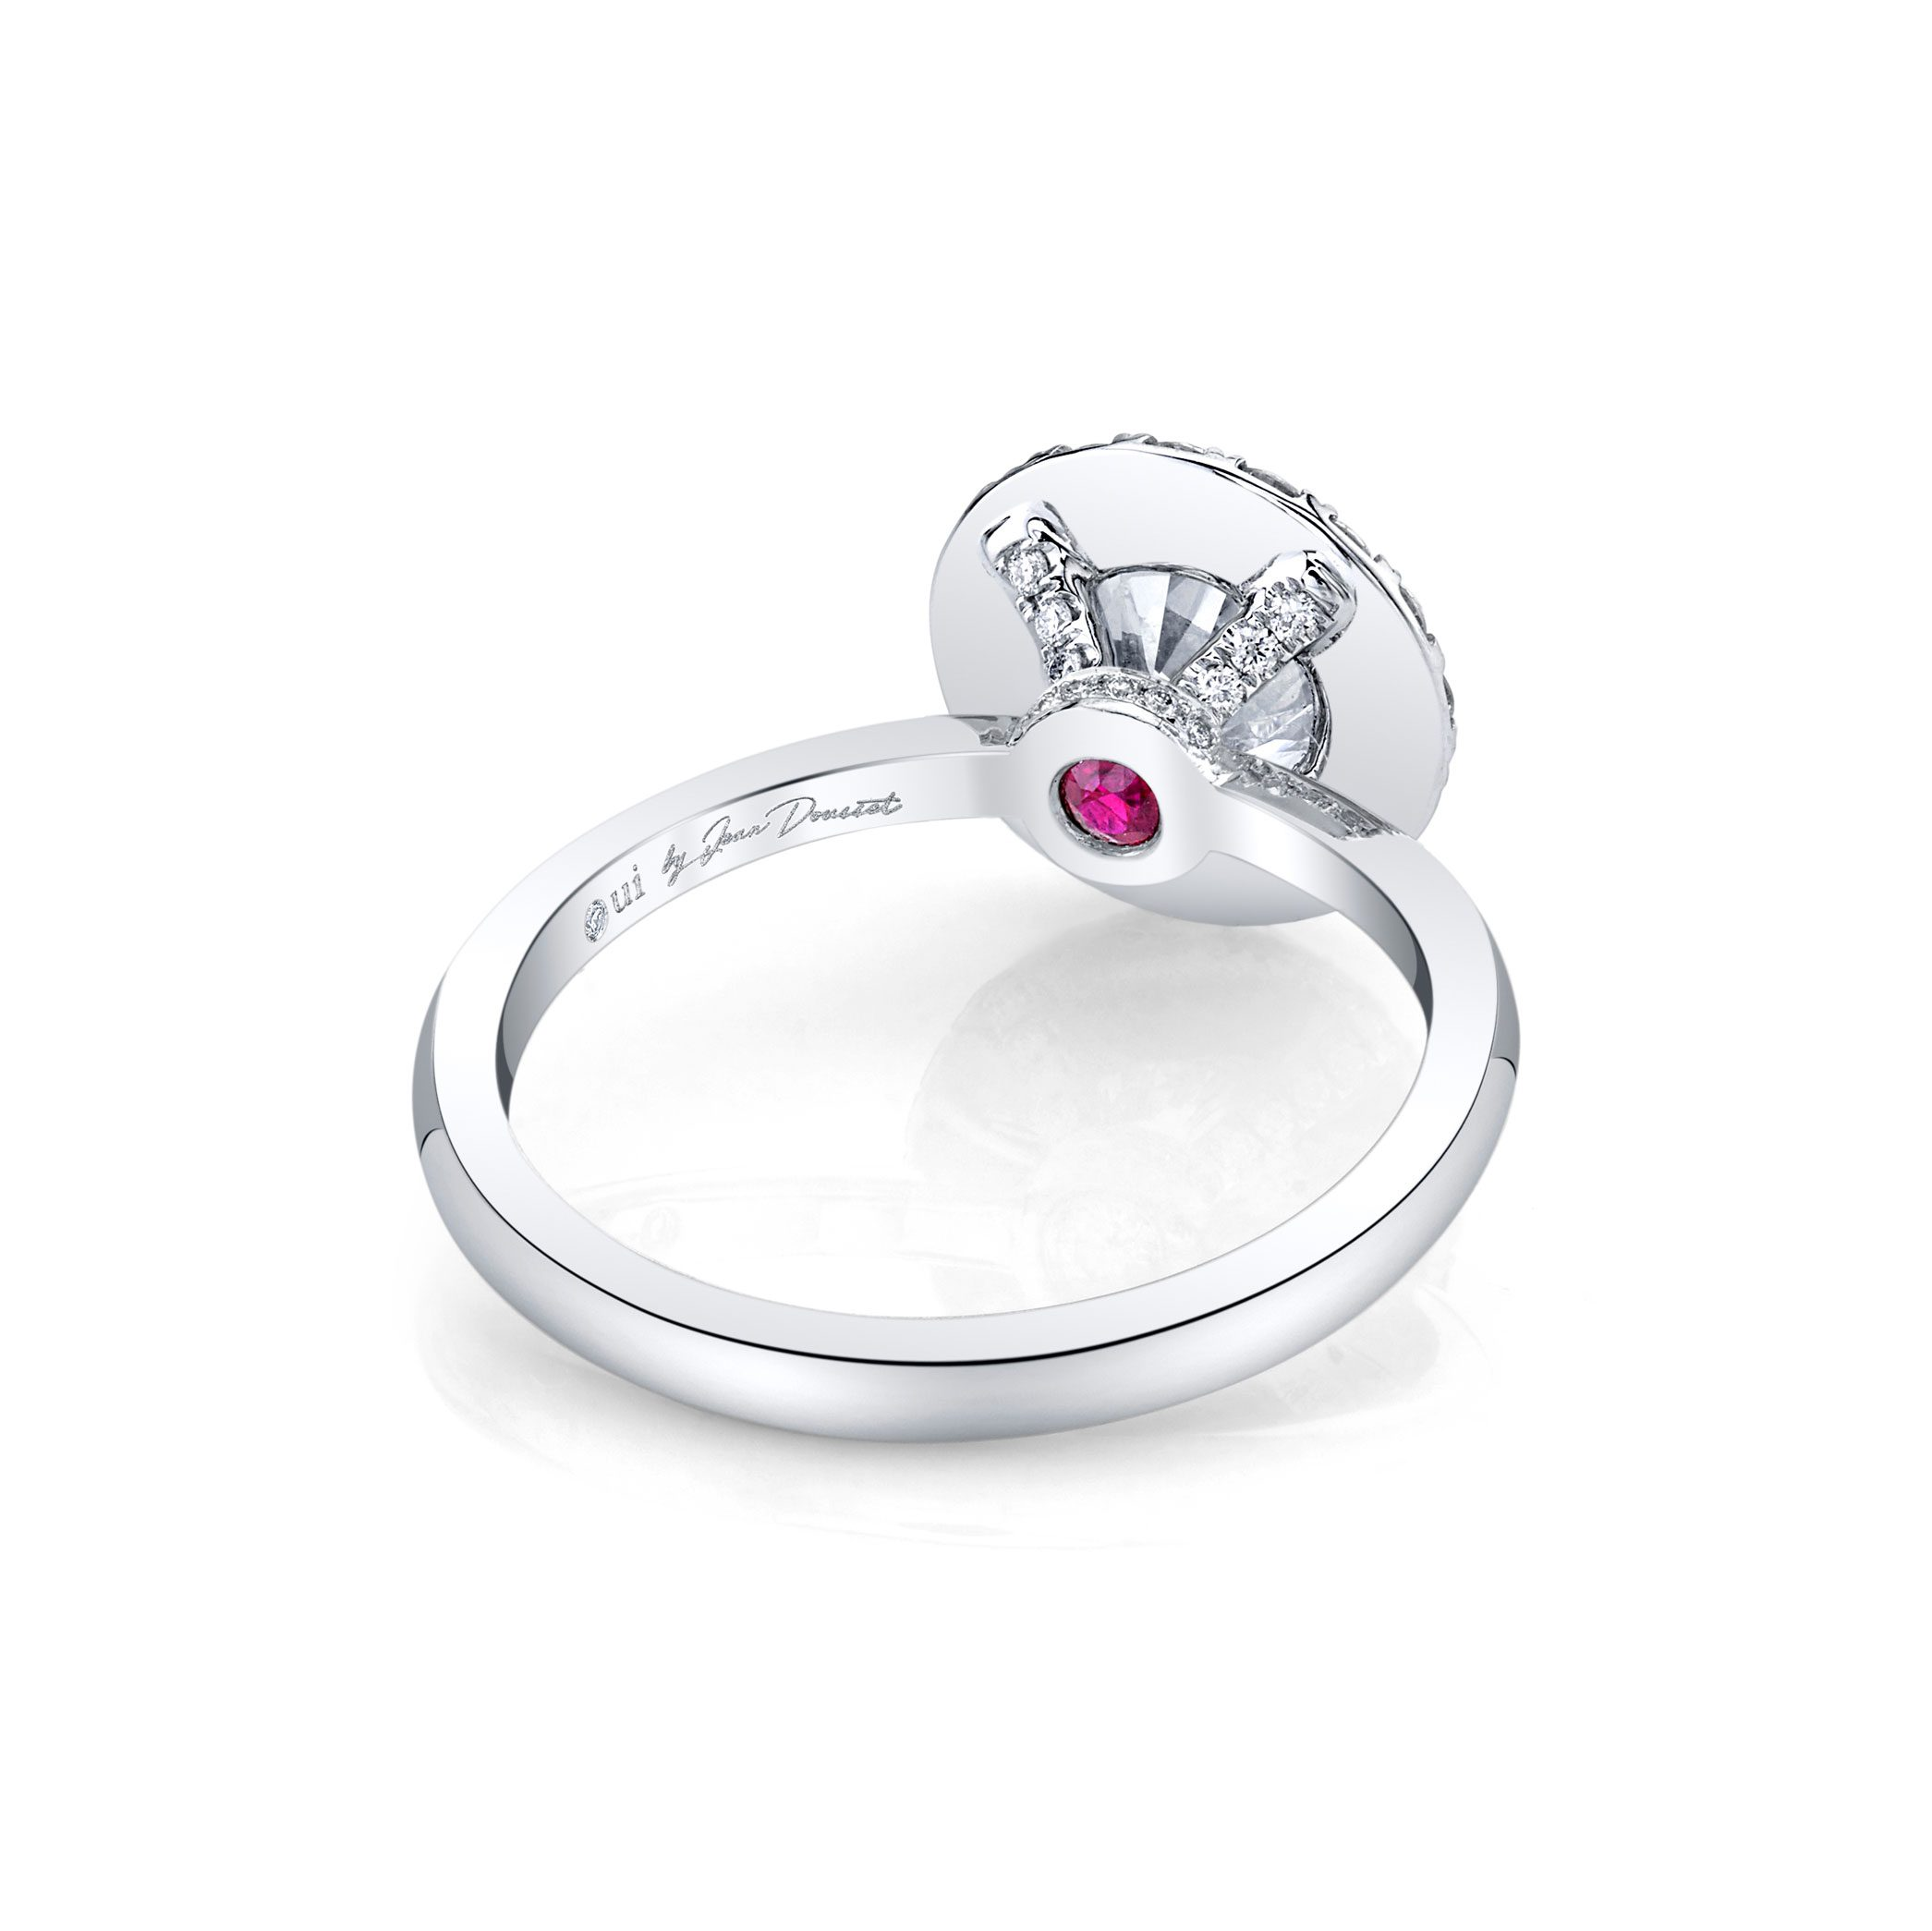 Colette Seamless Halo® Round Brilliant Engagement Ring 18k White Gold Back Shot